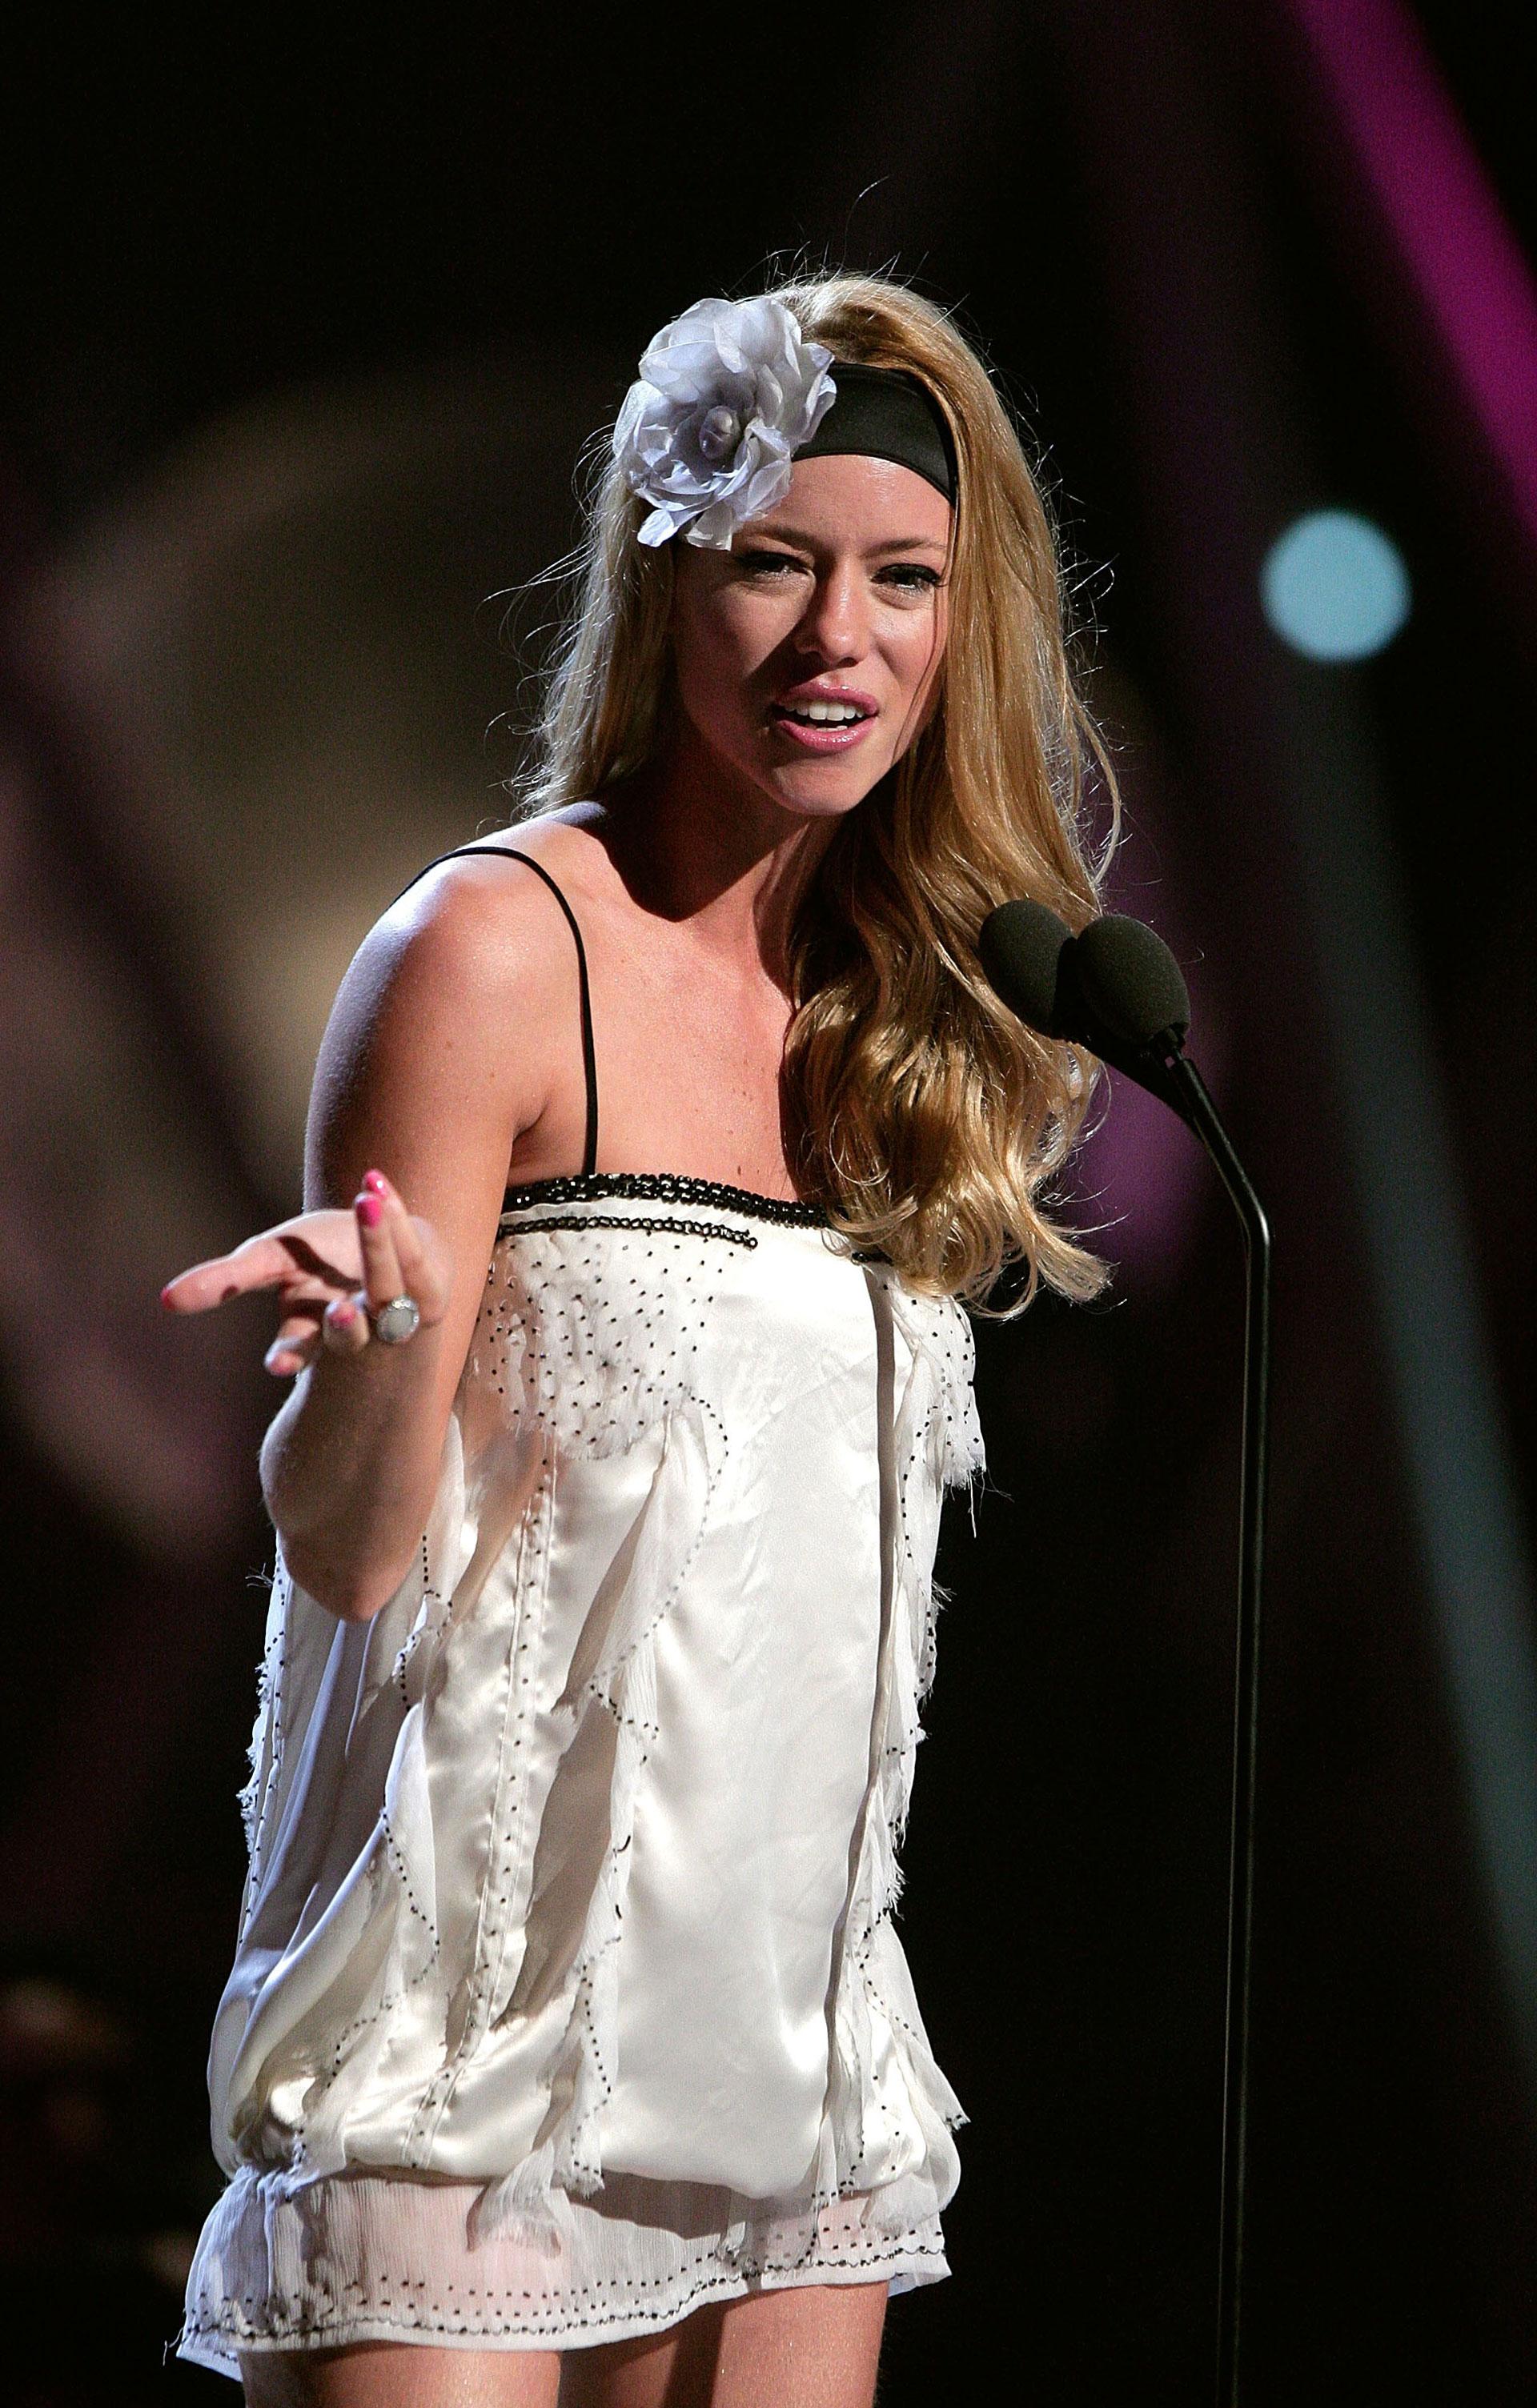 Nicole Neumann en los Premios MTV Latin America 2007